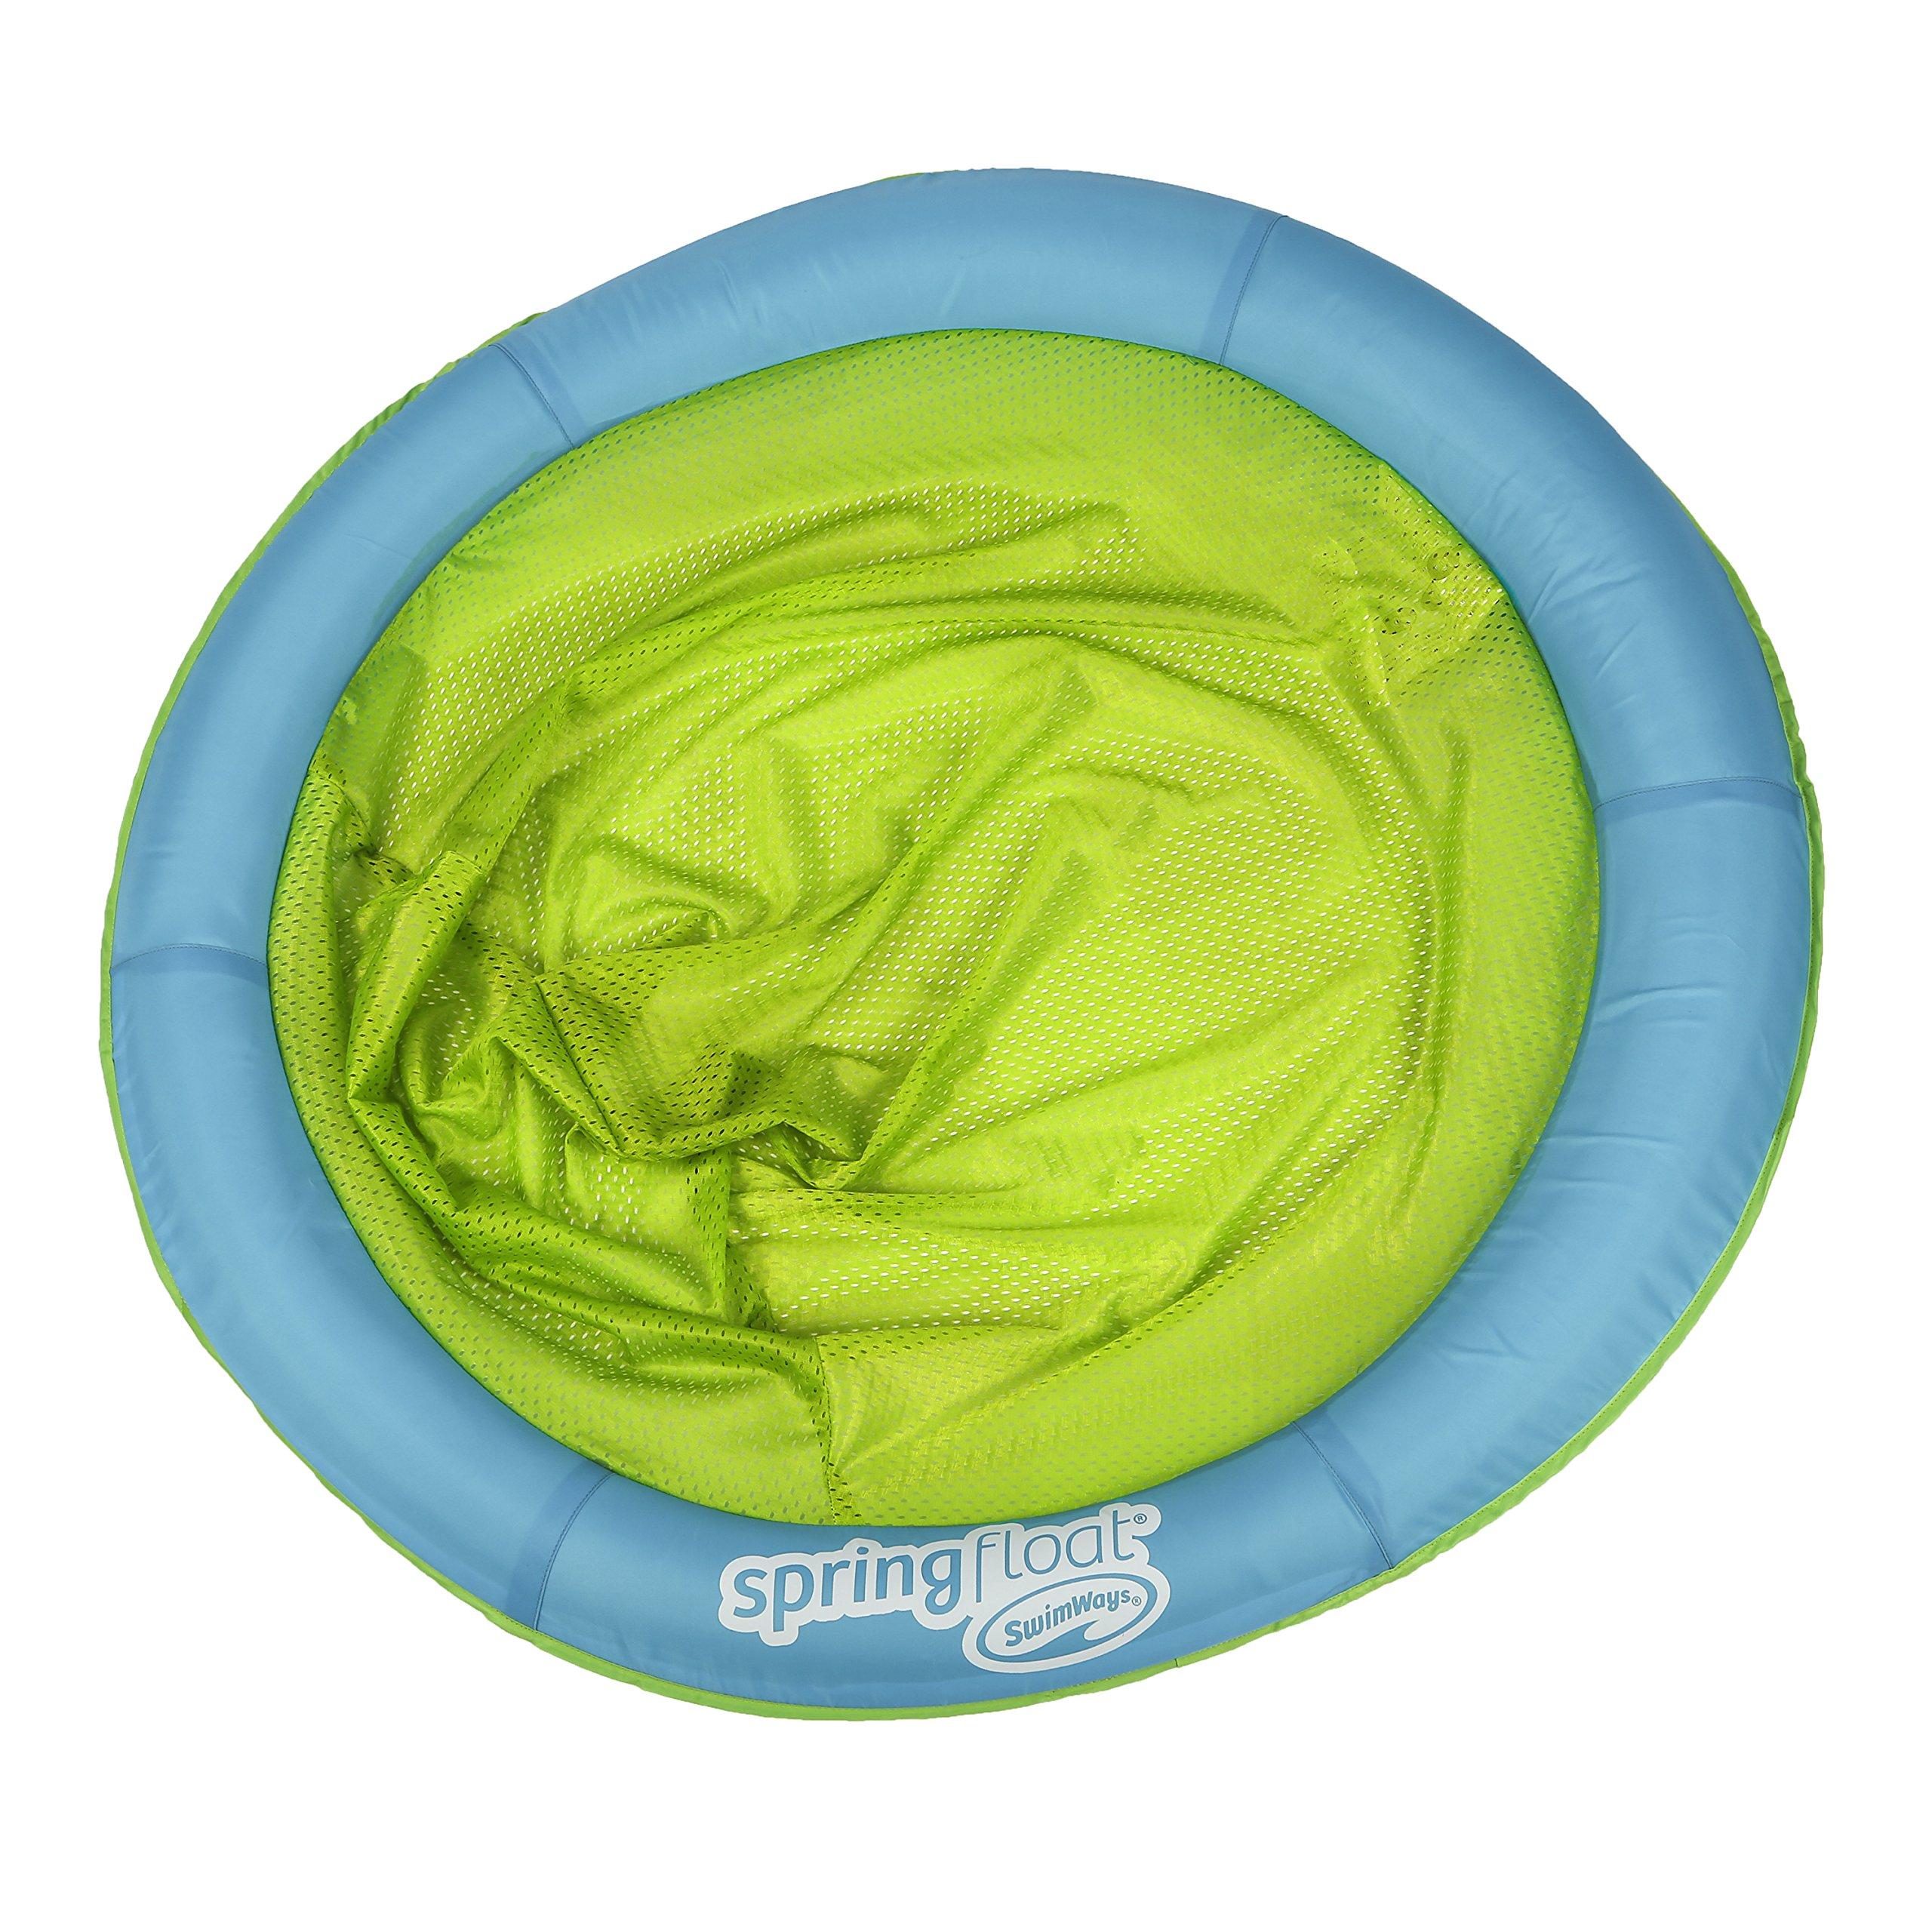 SwimWays Spring Float Papasan - Mesh Float for Pool or Lake - Light Blue/Lime by SwimWays (Image #1)